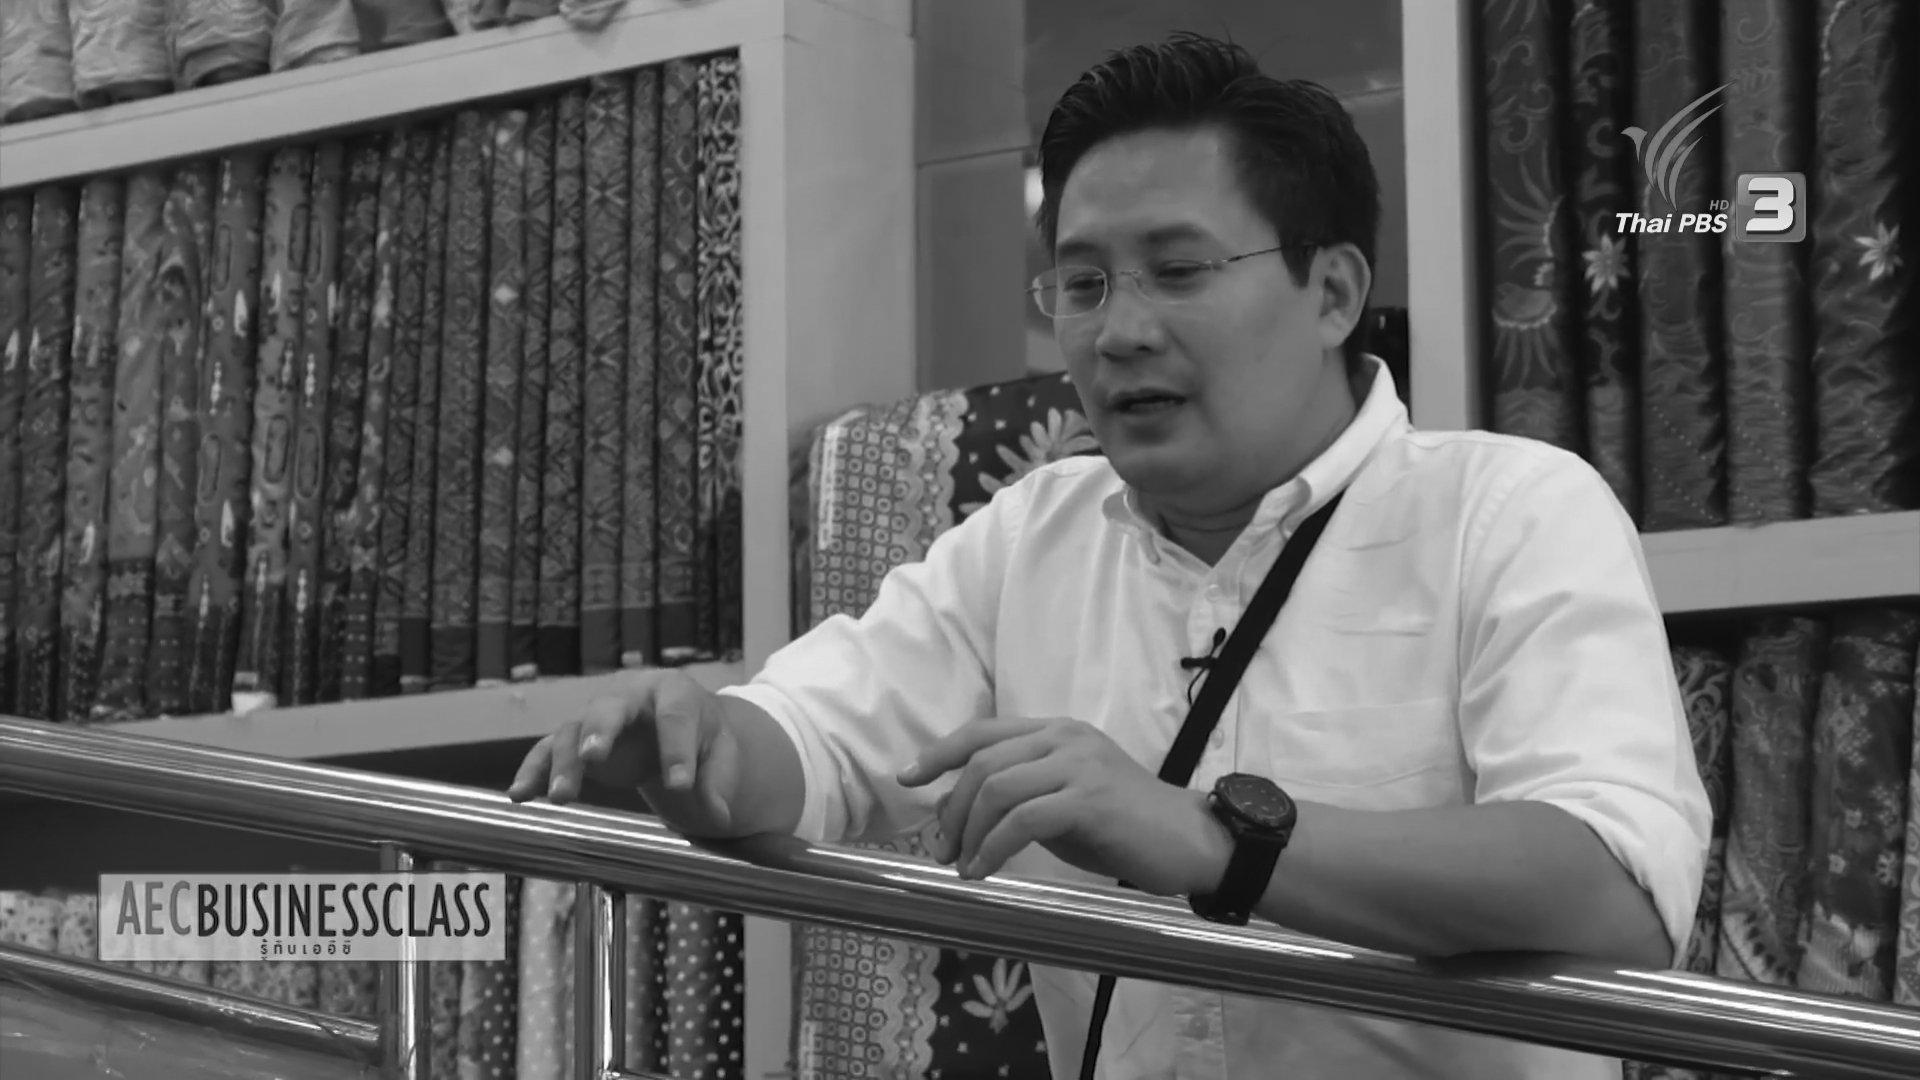 AEC Business Class  รู้ทันเออีซี - มาเจสติก พาซา ตลาดสินค้าแพรภัณฑ์, ต้นทุนการจัดตั้งธุรกิจในอินโดนีเซีย